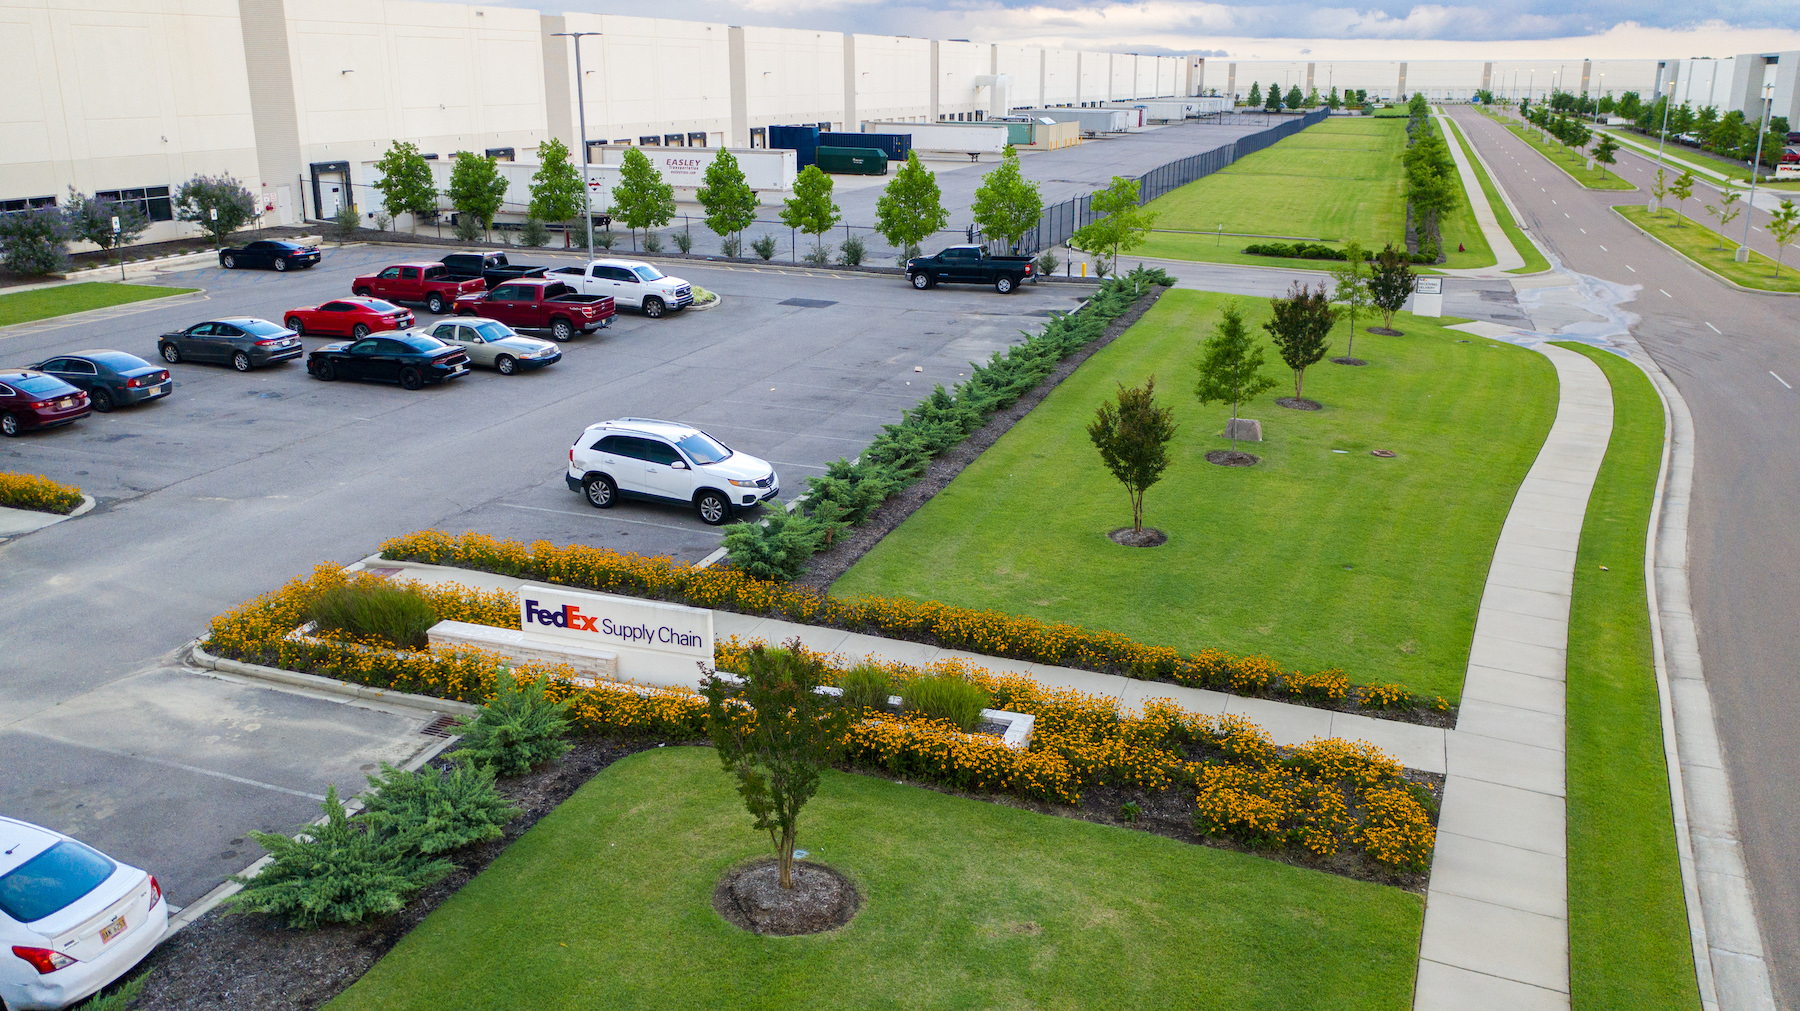 FedEx Warehouse landscaping